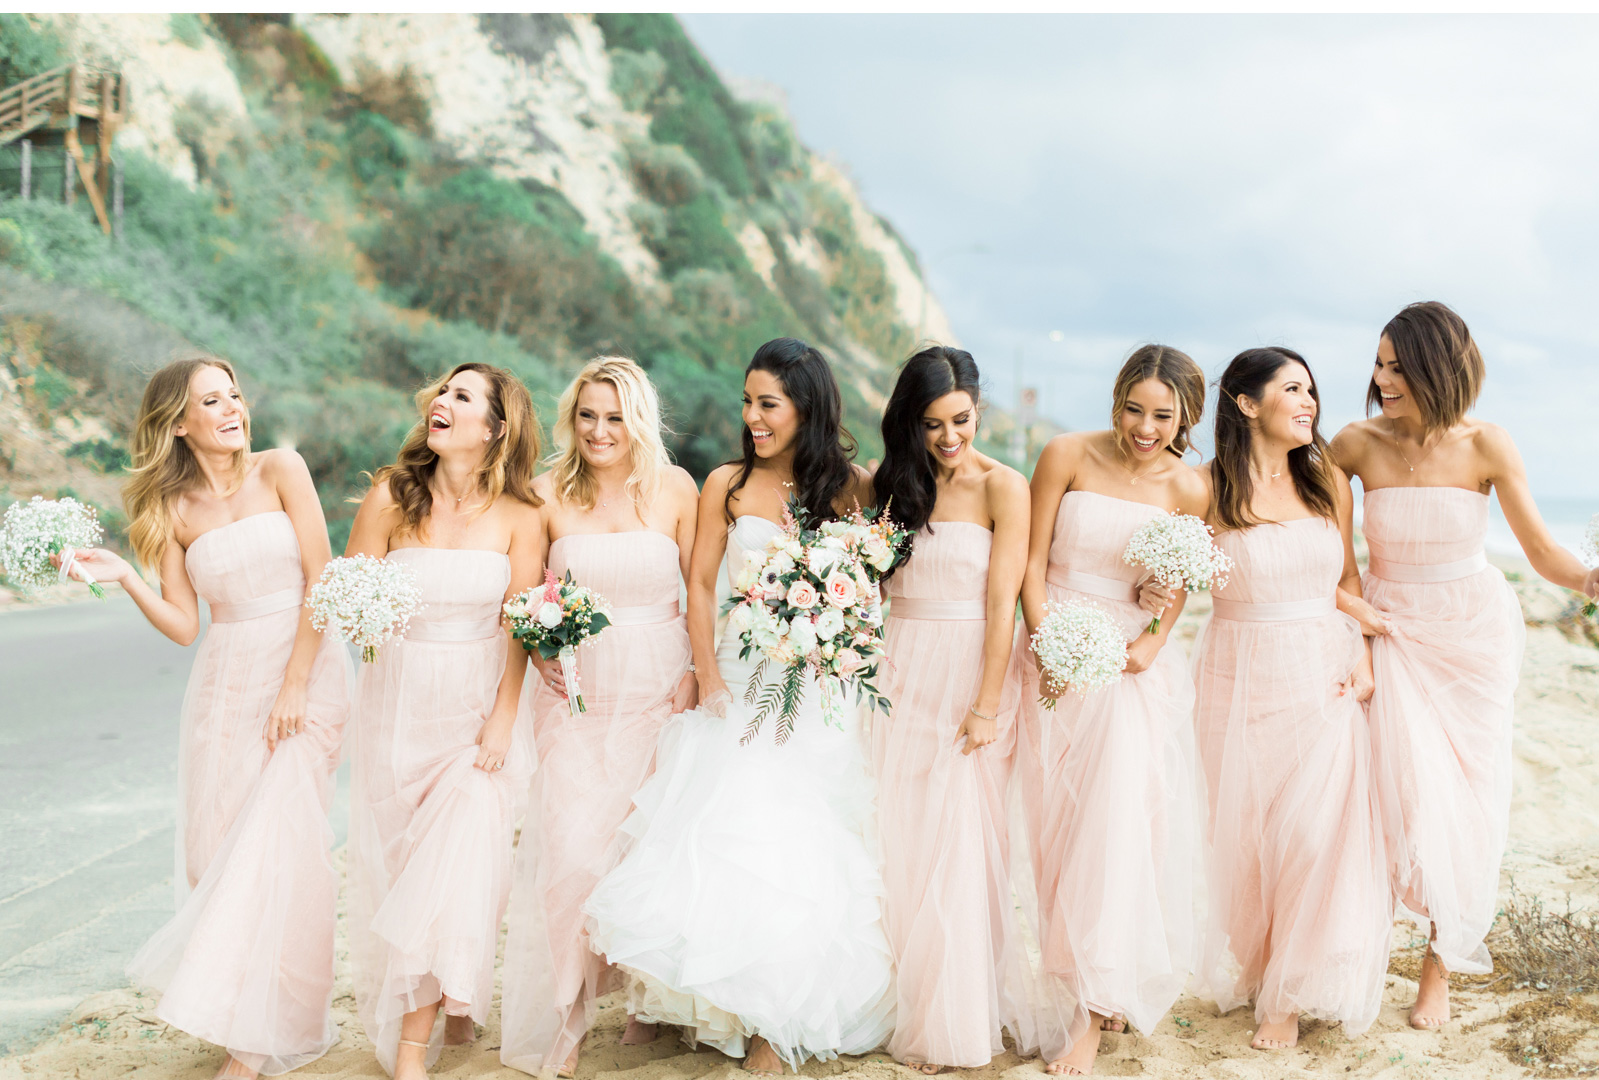 Rod-and-Lorin-Brewster-Style-Me-Pretty-Malibu-Beach-Wedding-Natalie-Schutt-Photography_08.jpg